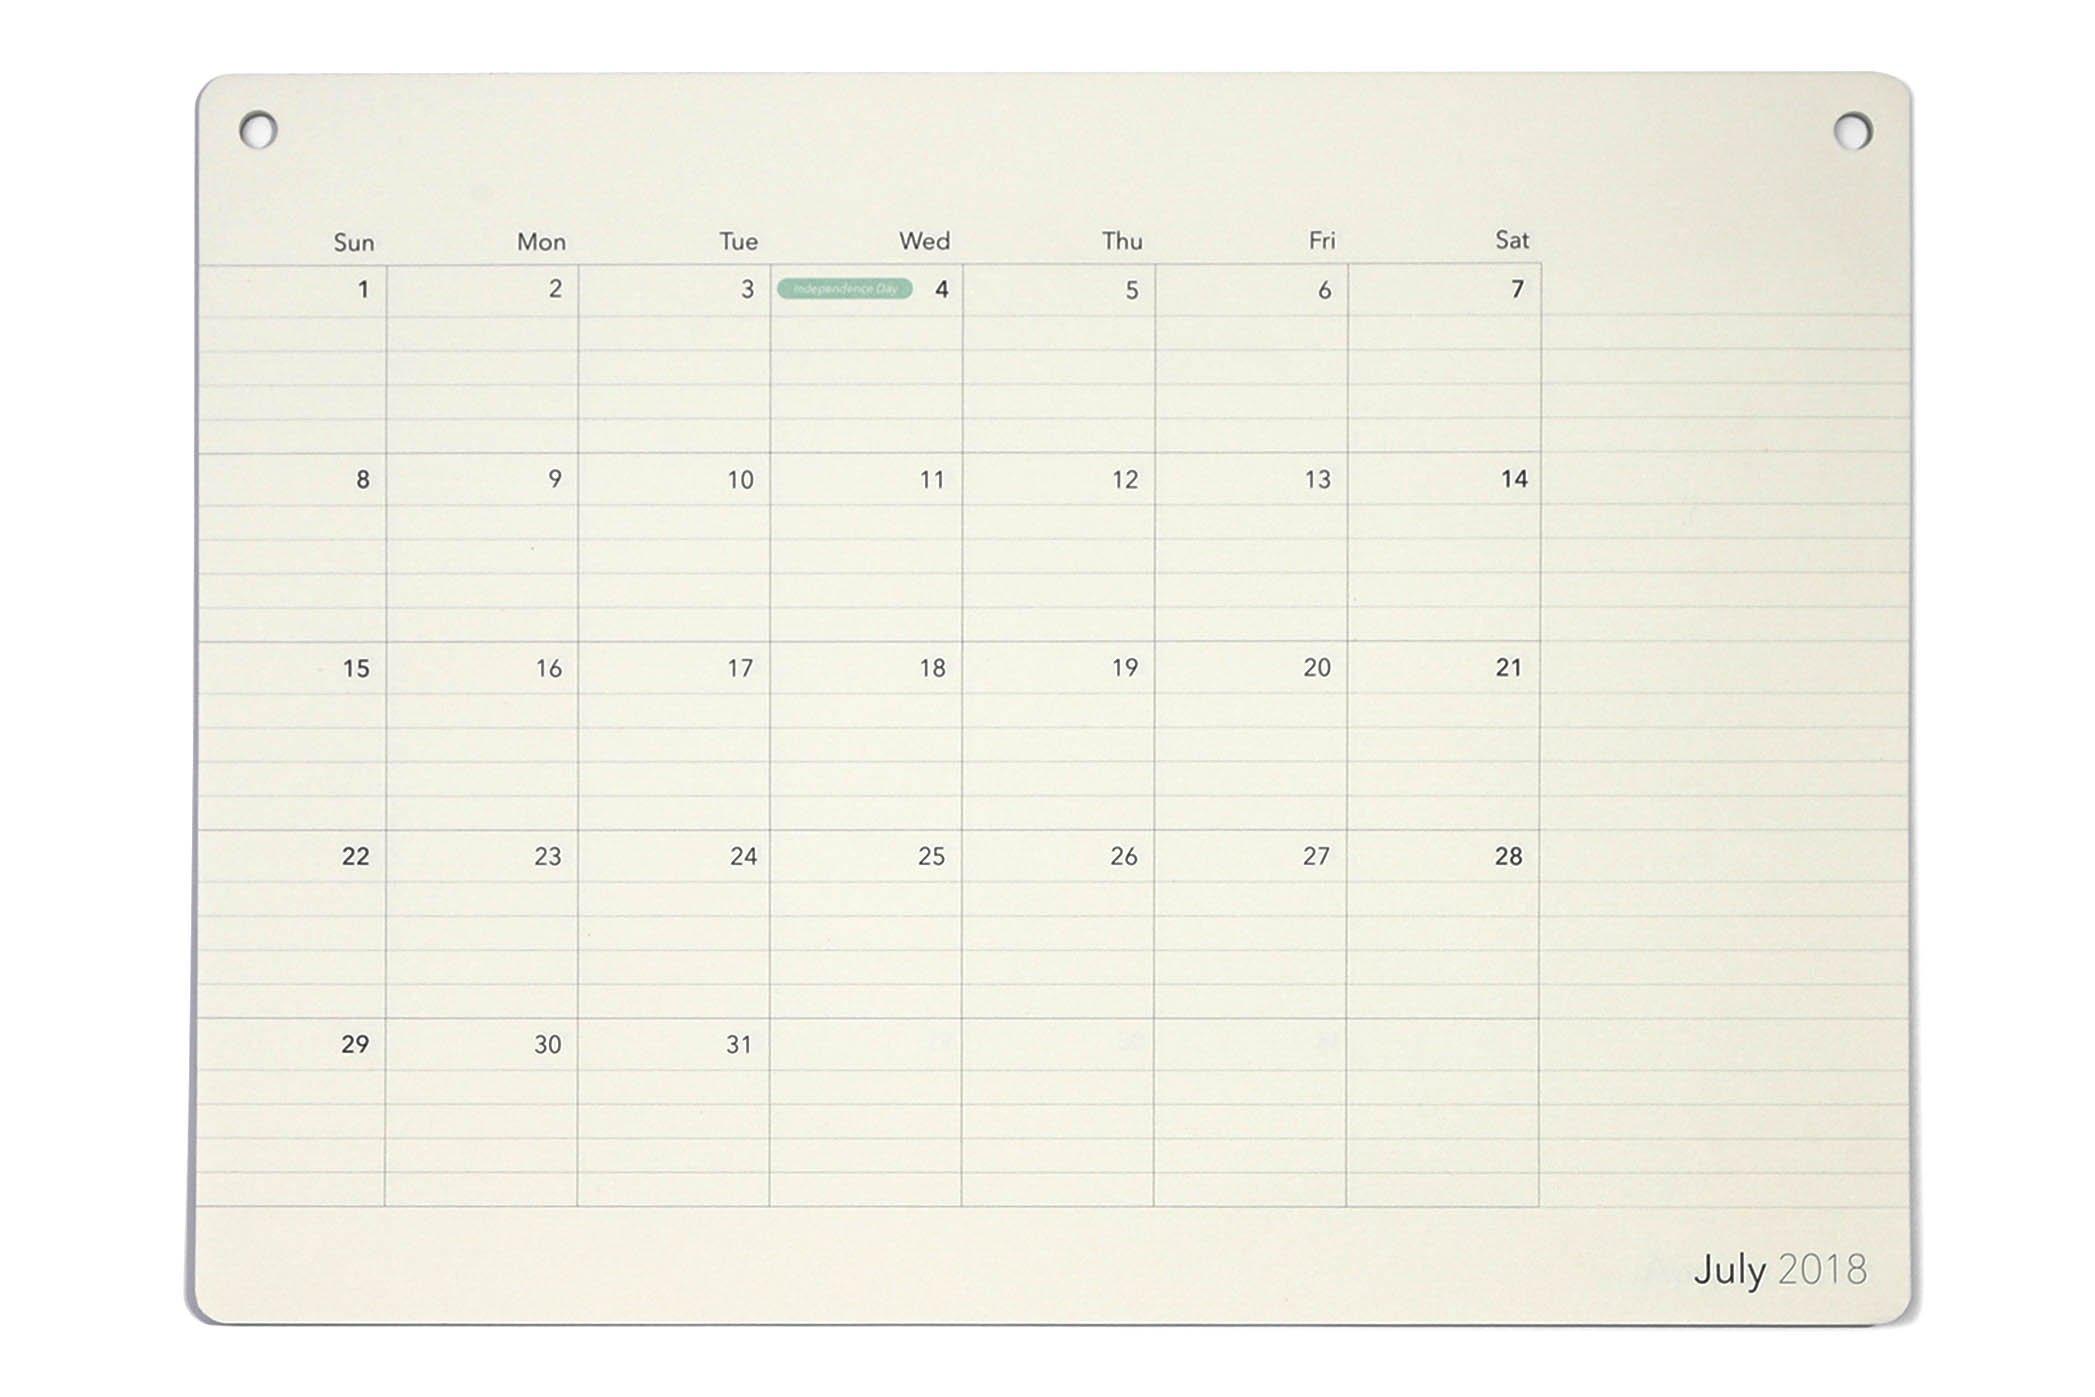 Elegant Desk Calendar · 18 Months · July 2018 - December 2019 · 17.8'' x 13'' · Wall Calendar · Desk Pad Monthly Planner (17.8'' x 13'', Ruled)